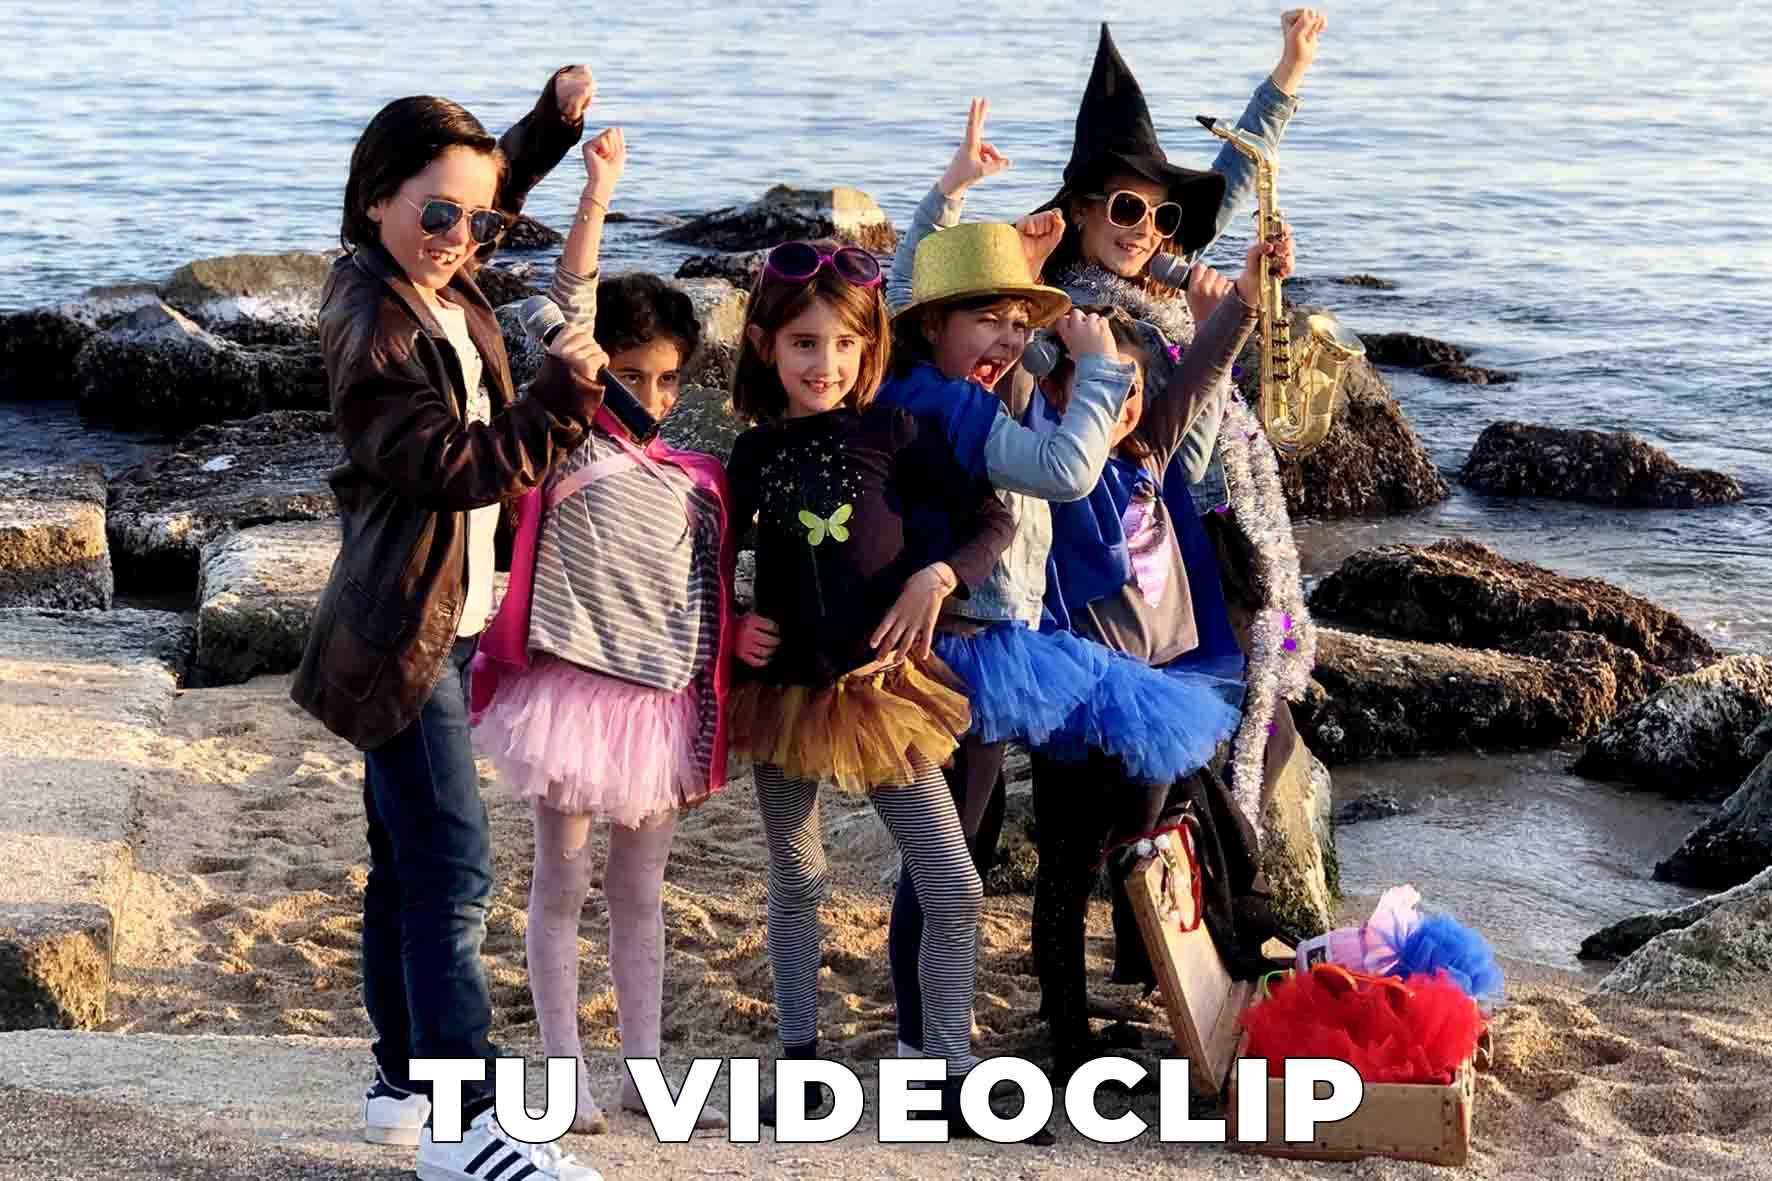 kids videoclip